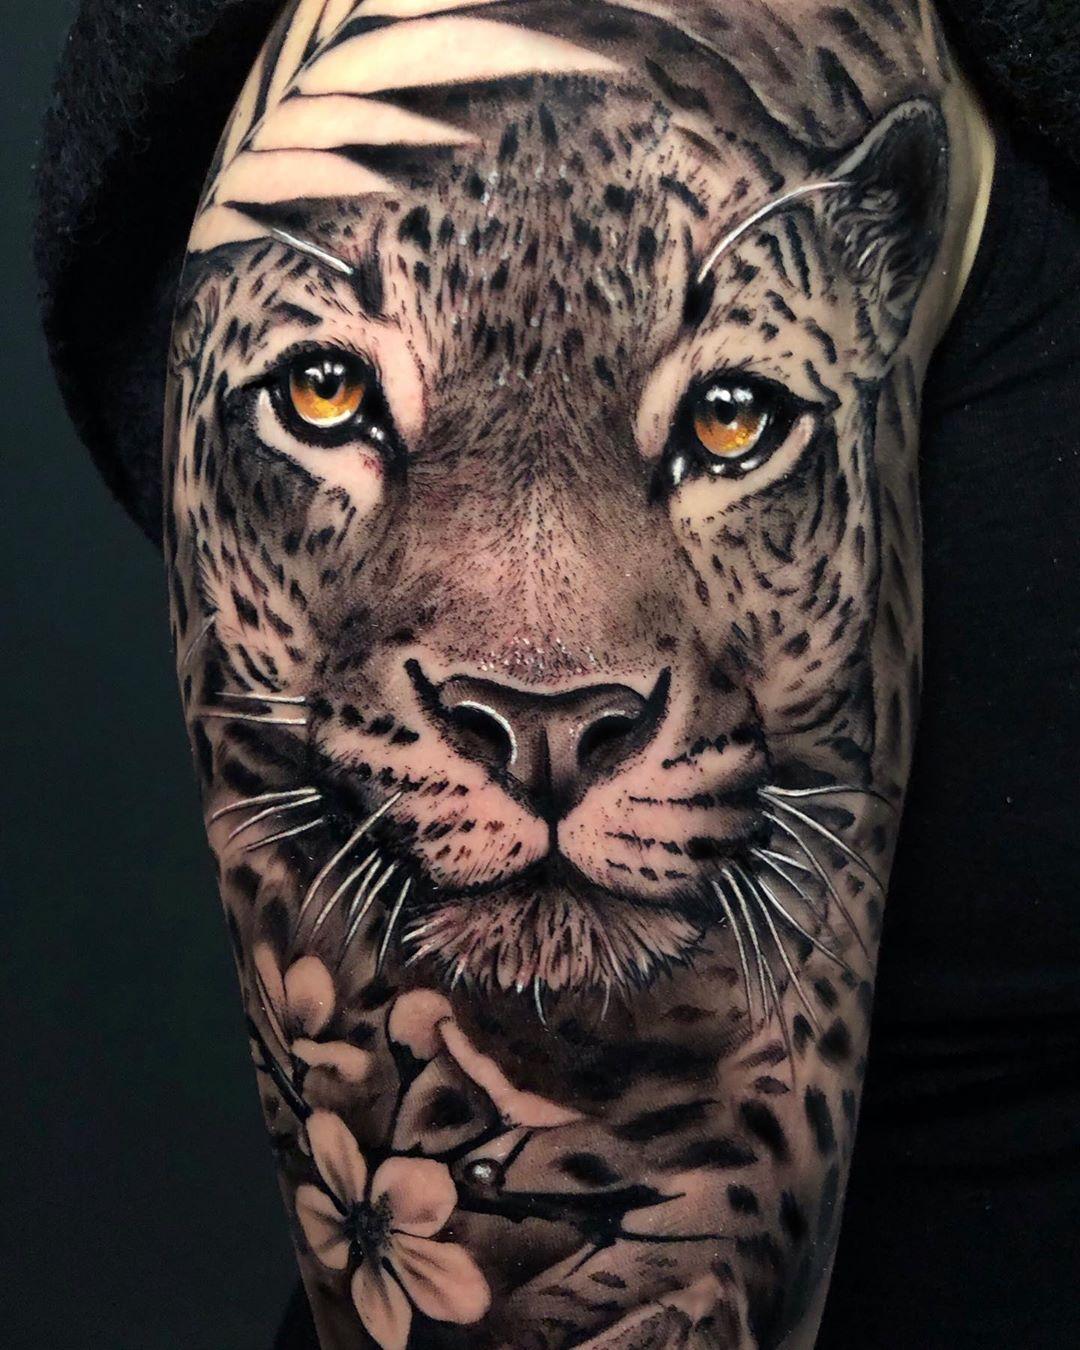 followforfollow,berlin,followmeciudadreal,ciudadreal,tomelloso,almagro,puertollano,tatuajesenpuertollano,tatuajesendaimiel,ciudadrealtattoo,ciudadrealtatuajes,tatuajesciudadreal,follow,ciudadrealtatuajes,puertollano,tattooers,besttattooers,juantabasco,ciudadrealsetatua,ink,tatuajes,realiismo,realistictattoo,ciudadrealtattoo,tatuajesenpuertollano,traditionaltattoos